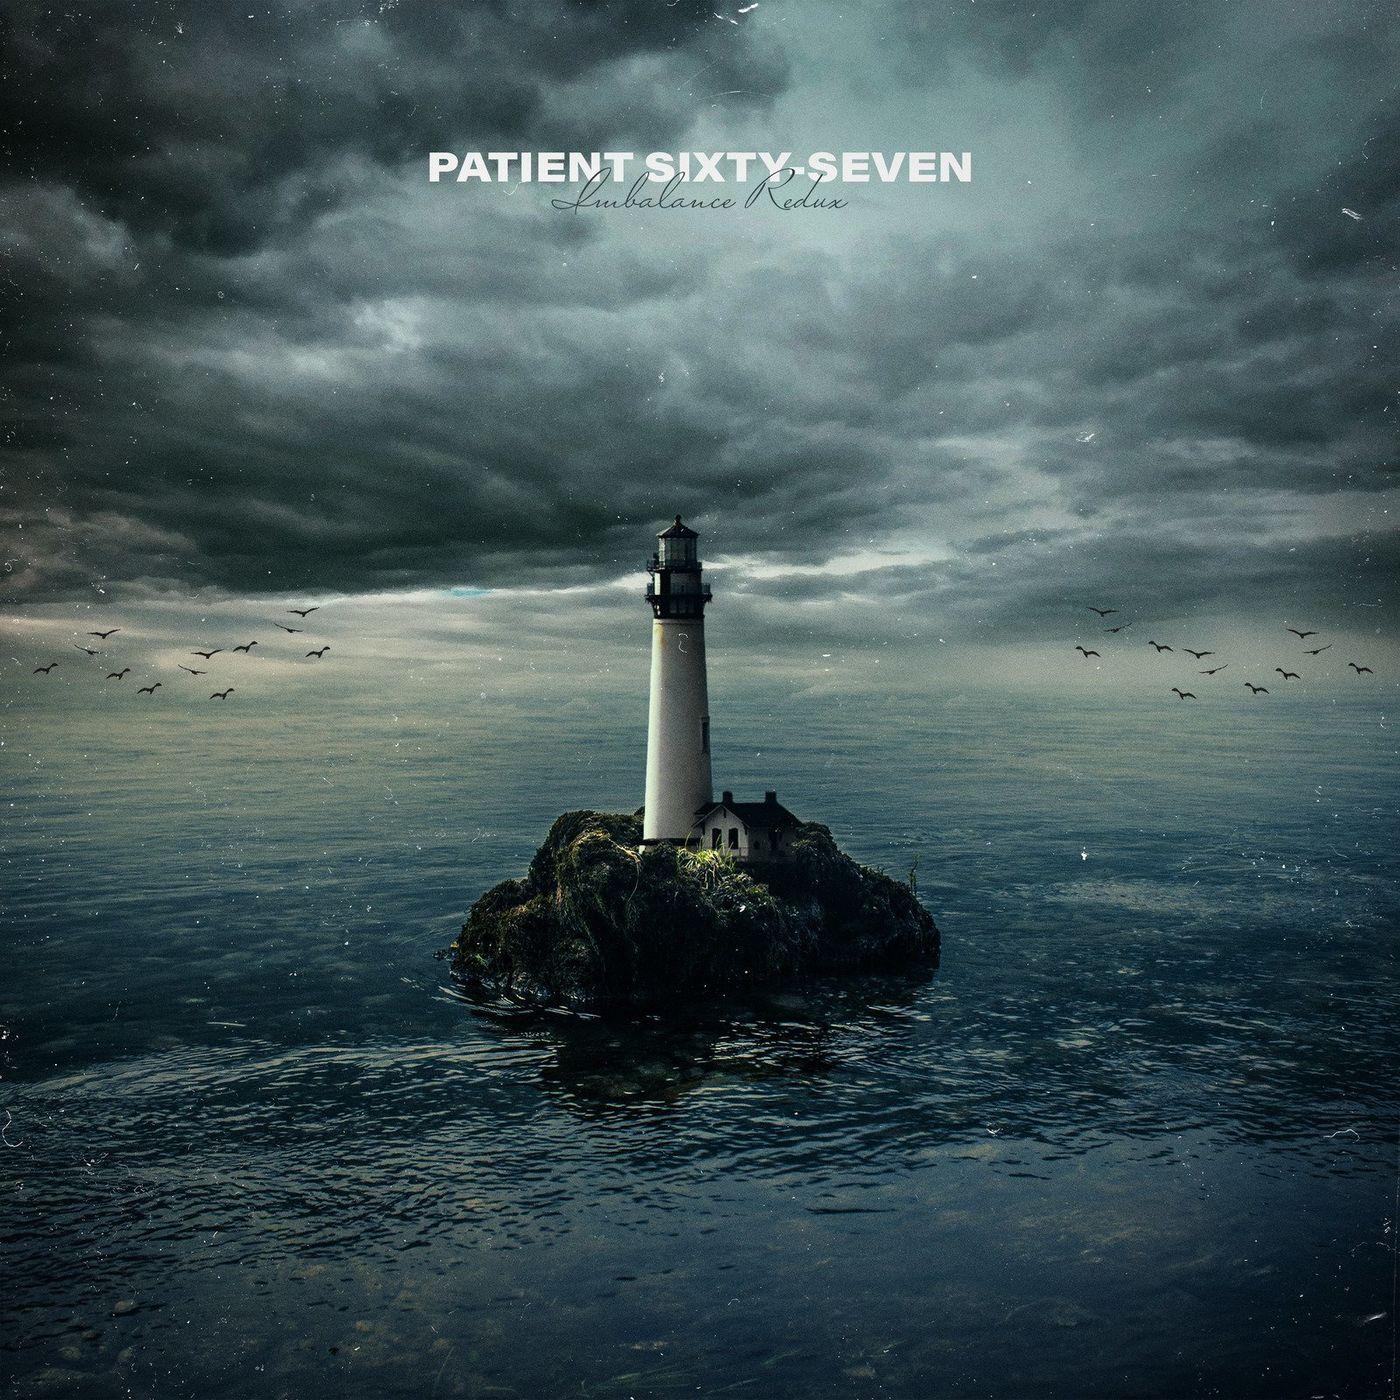 Patient Sixty-Seven - Imbalance Redux (2020)